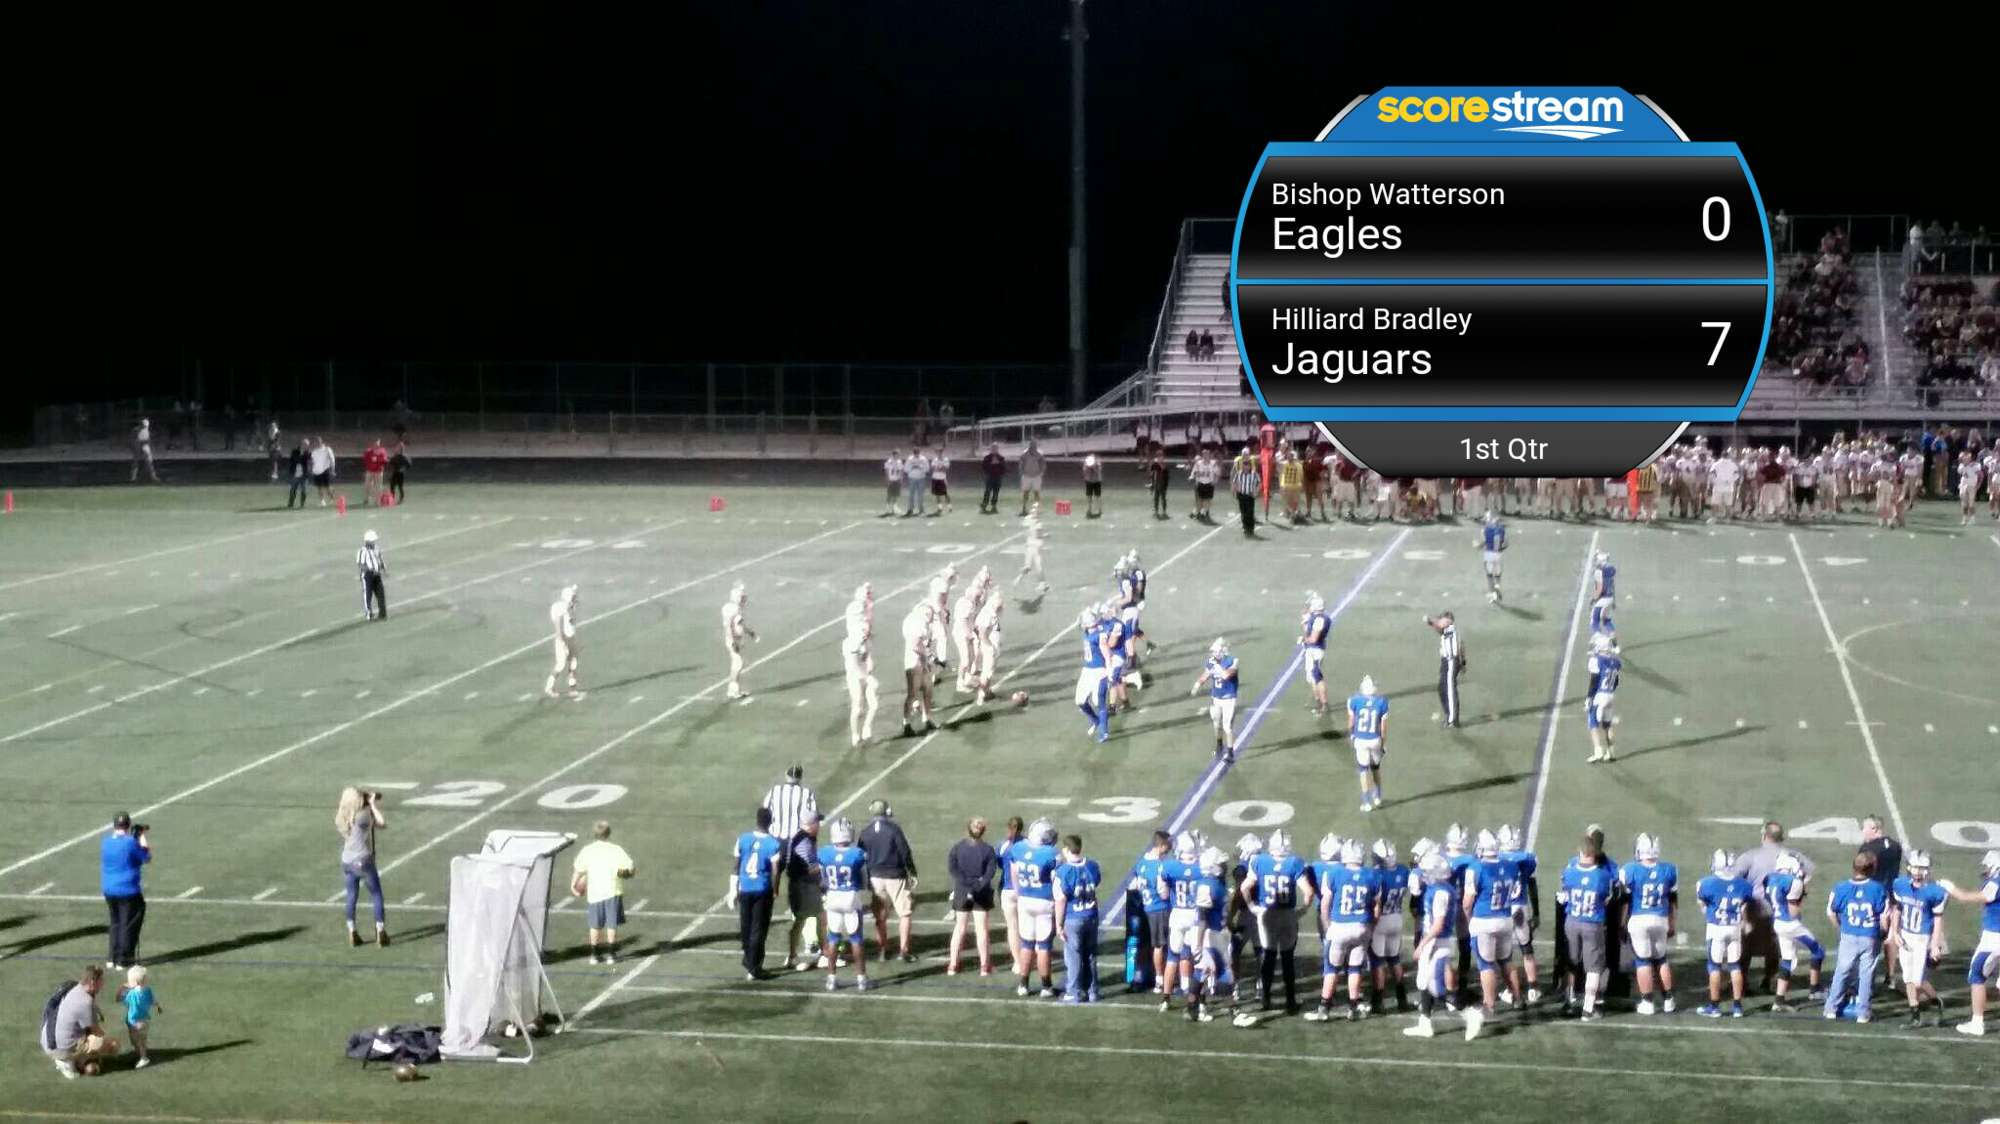 The Hilliard Bradley Jaguars Defeat The Bishop Watterson Eagles 23